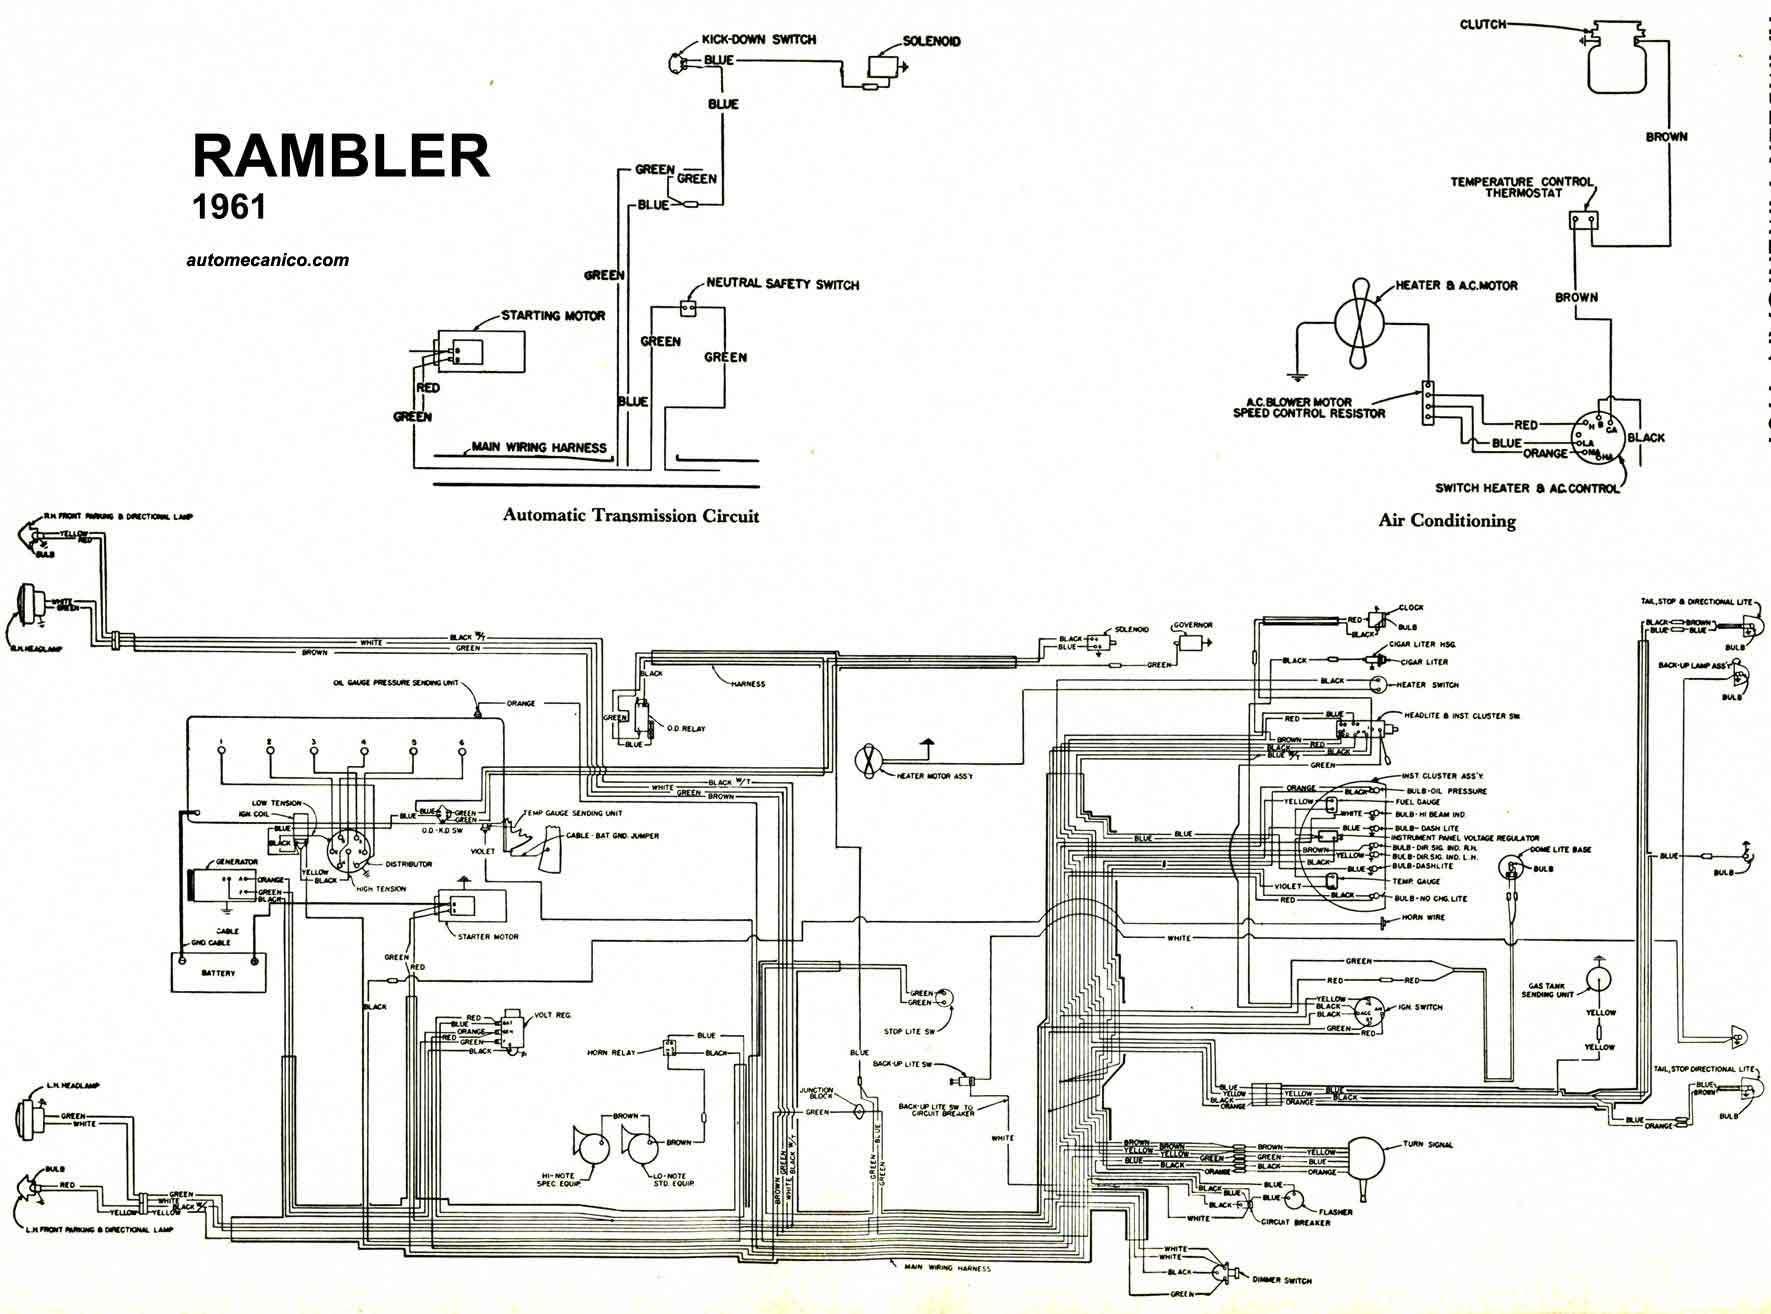 Wm Gentex 453 Wiring Diagram Wiring Diagram